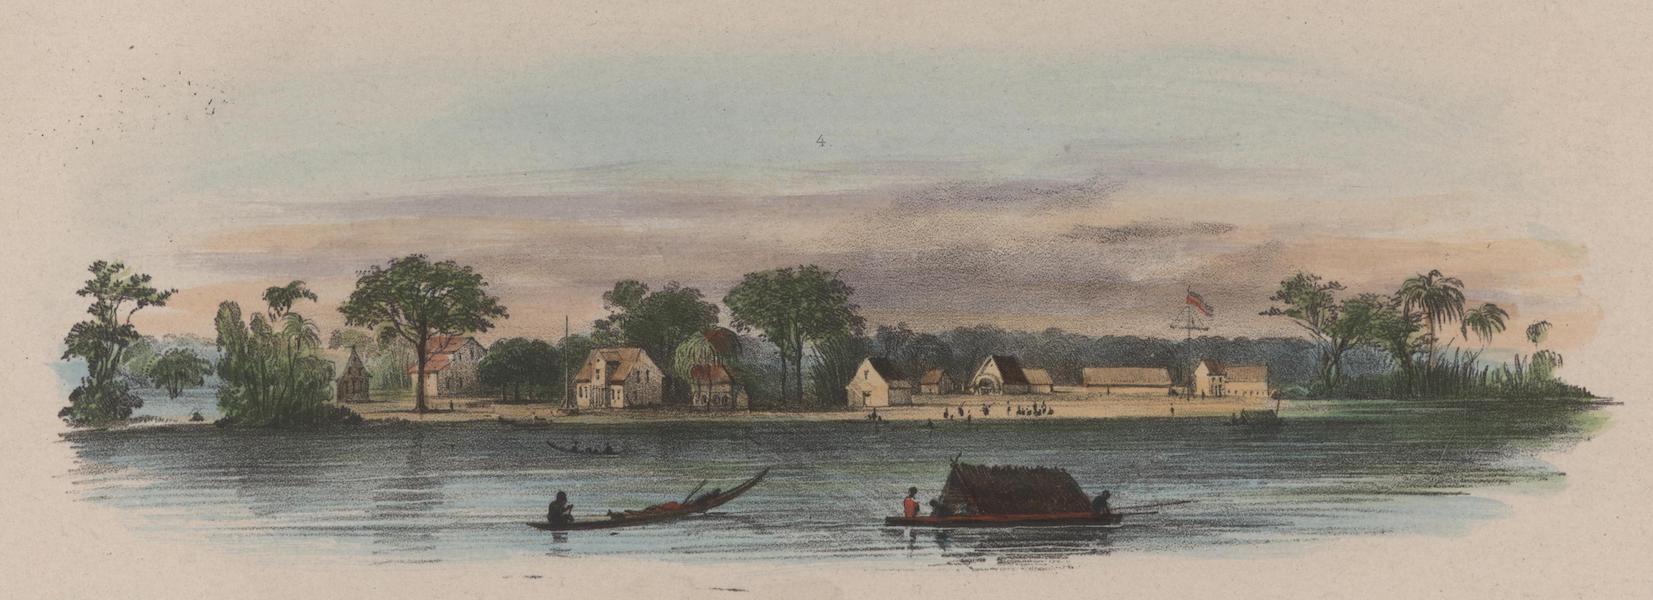 Voyage a Surinam - Jagt-Lust, Delices de Chasse (1839)